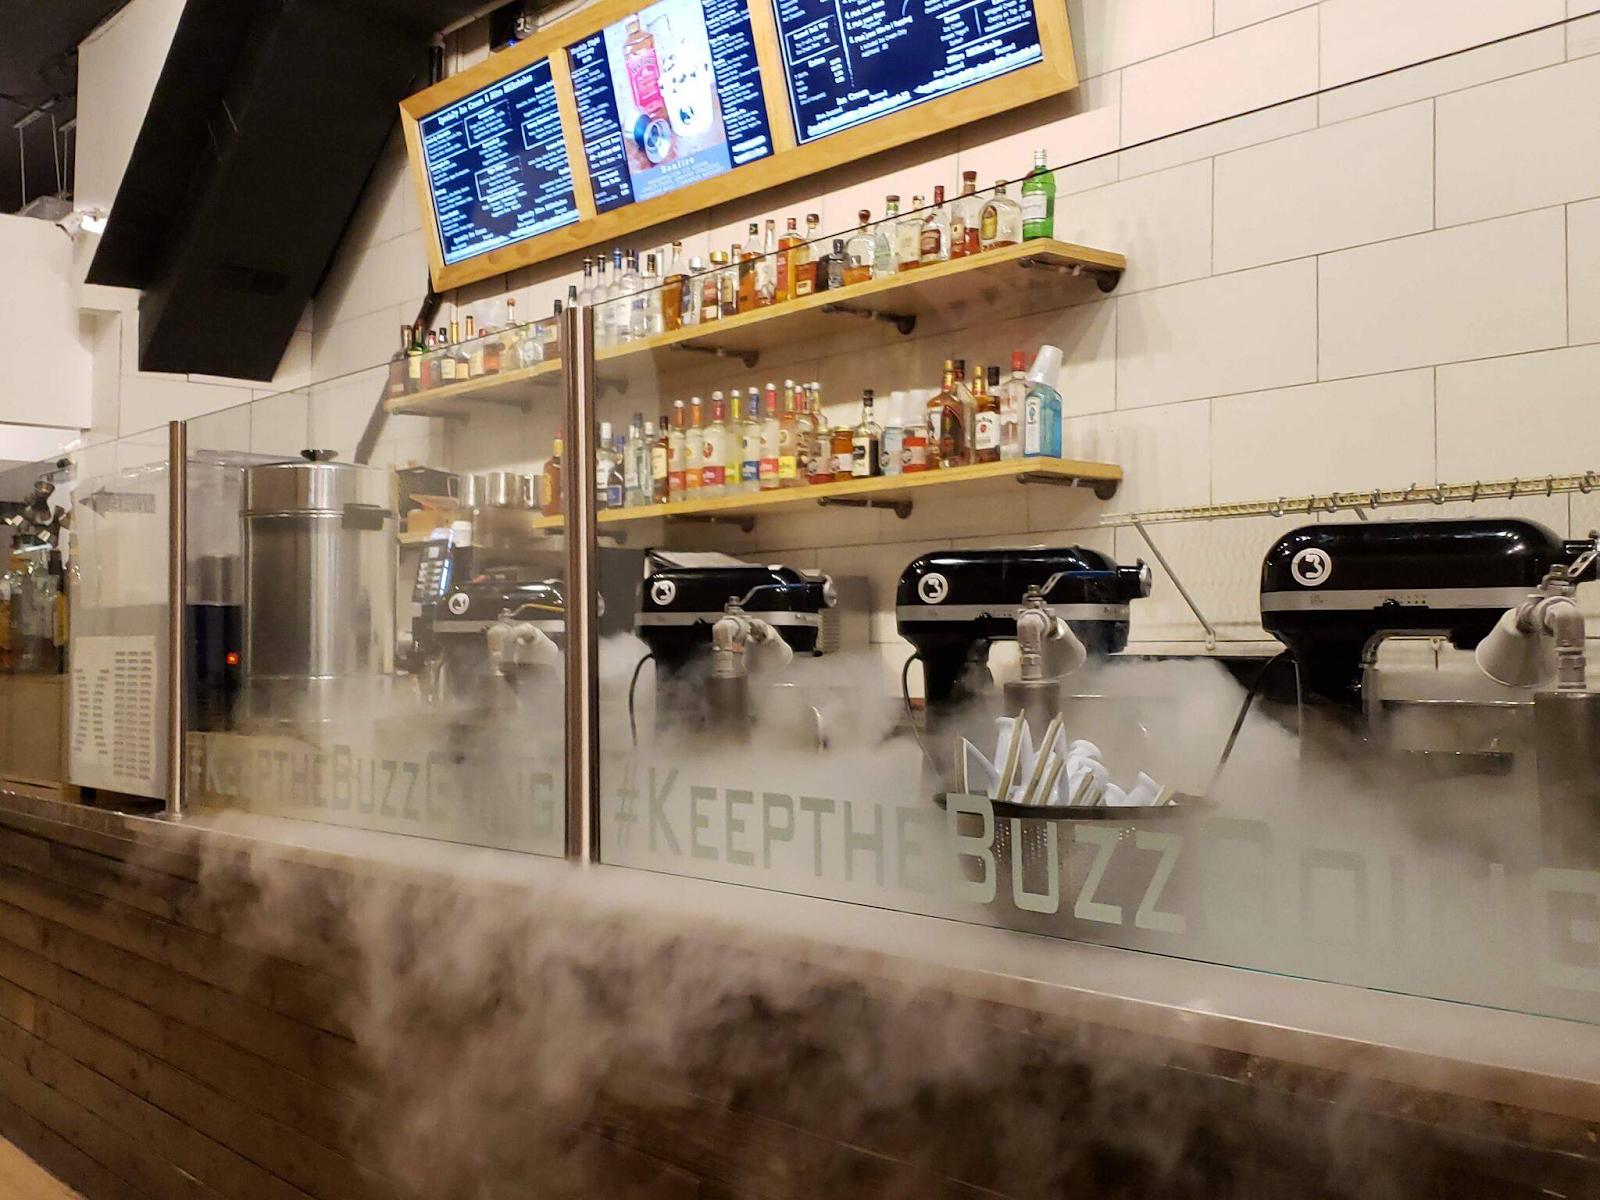 Get a spiked milkshake at this bar